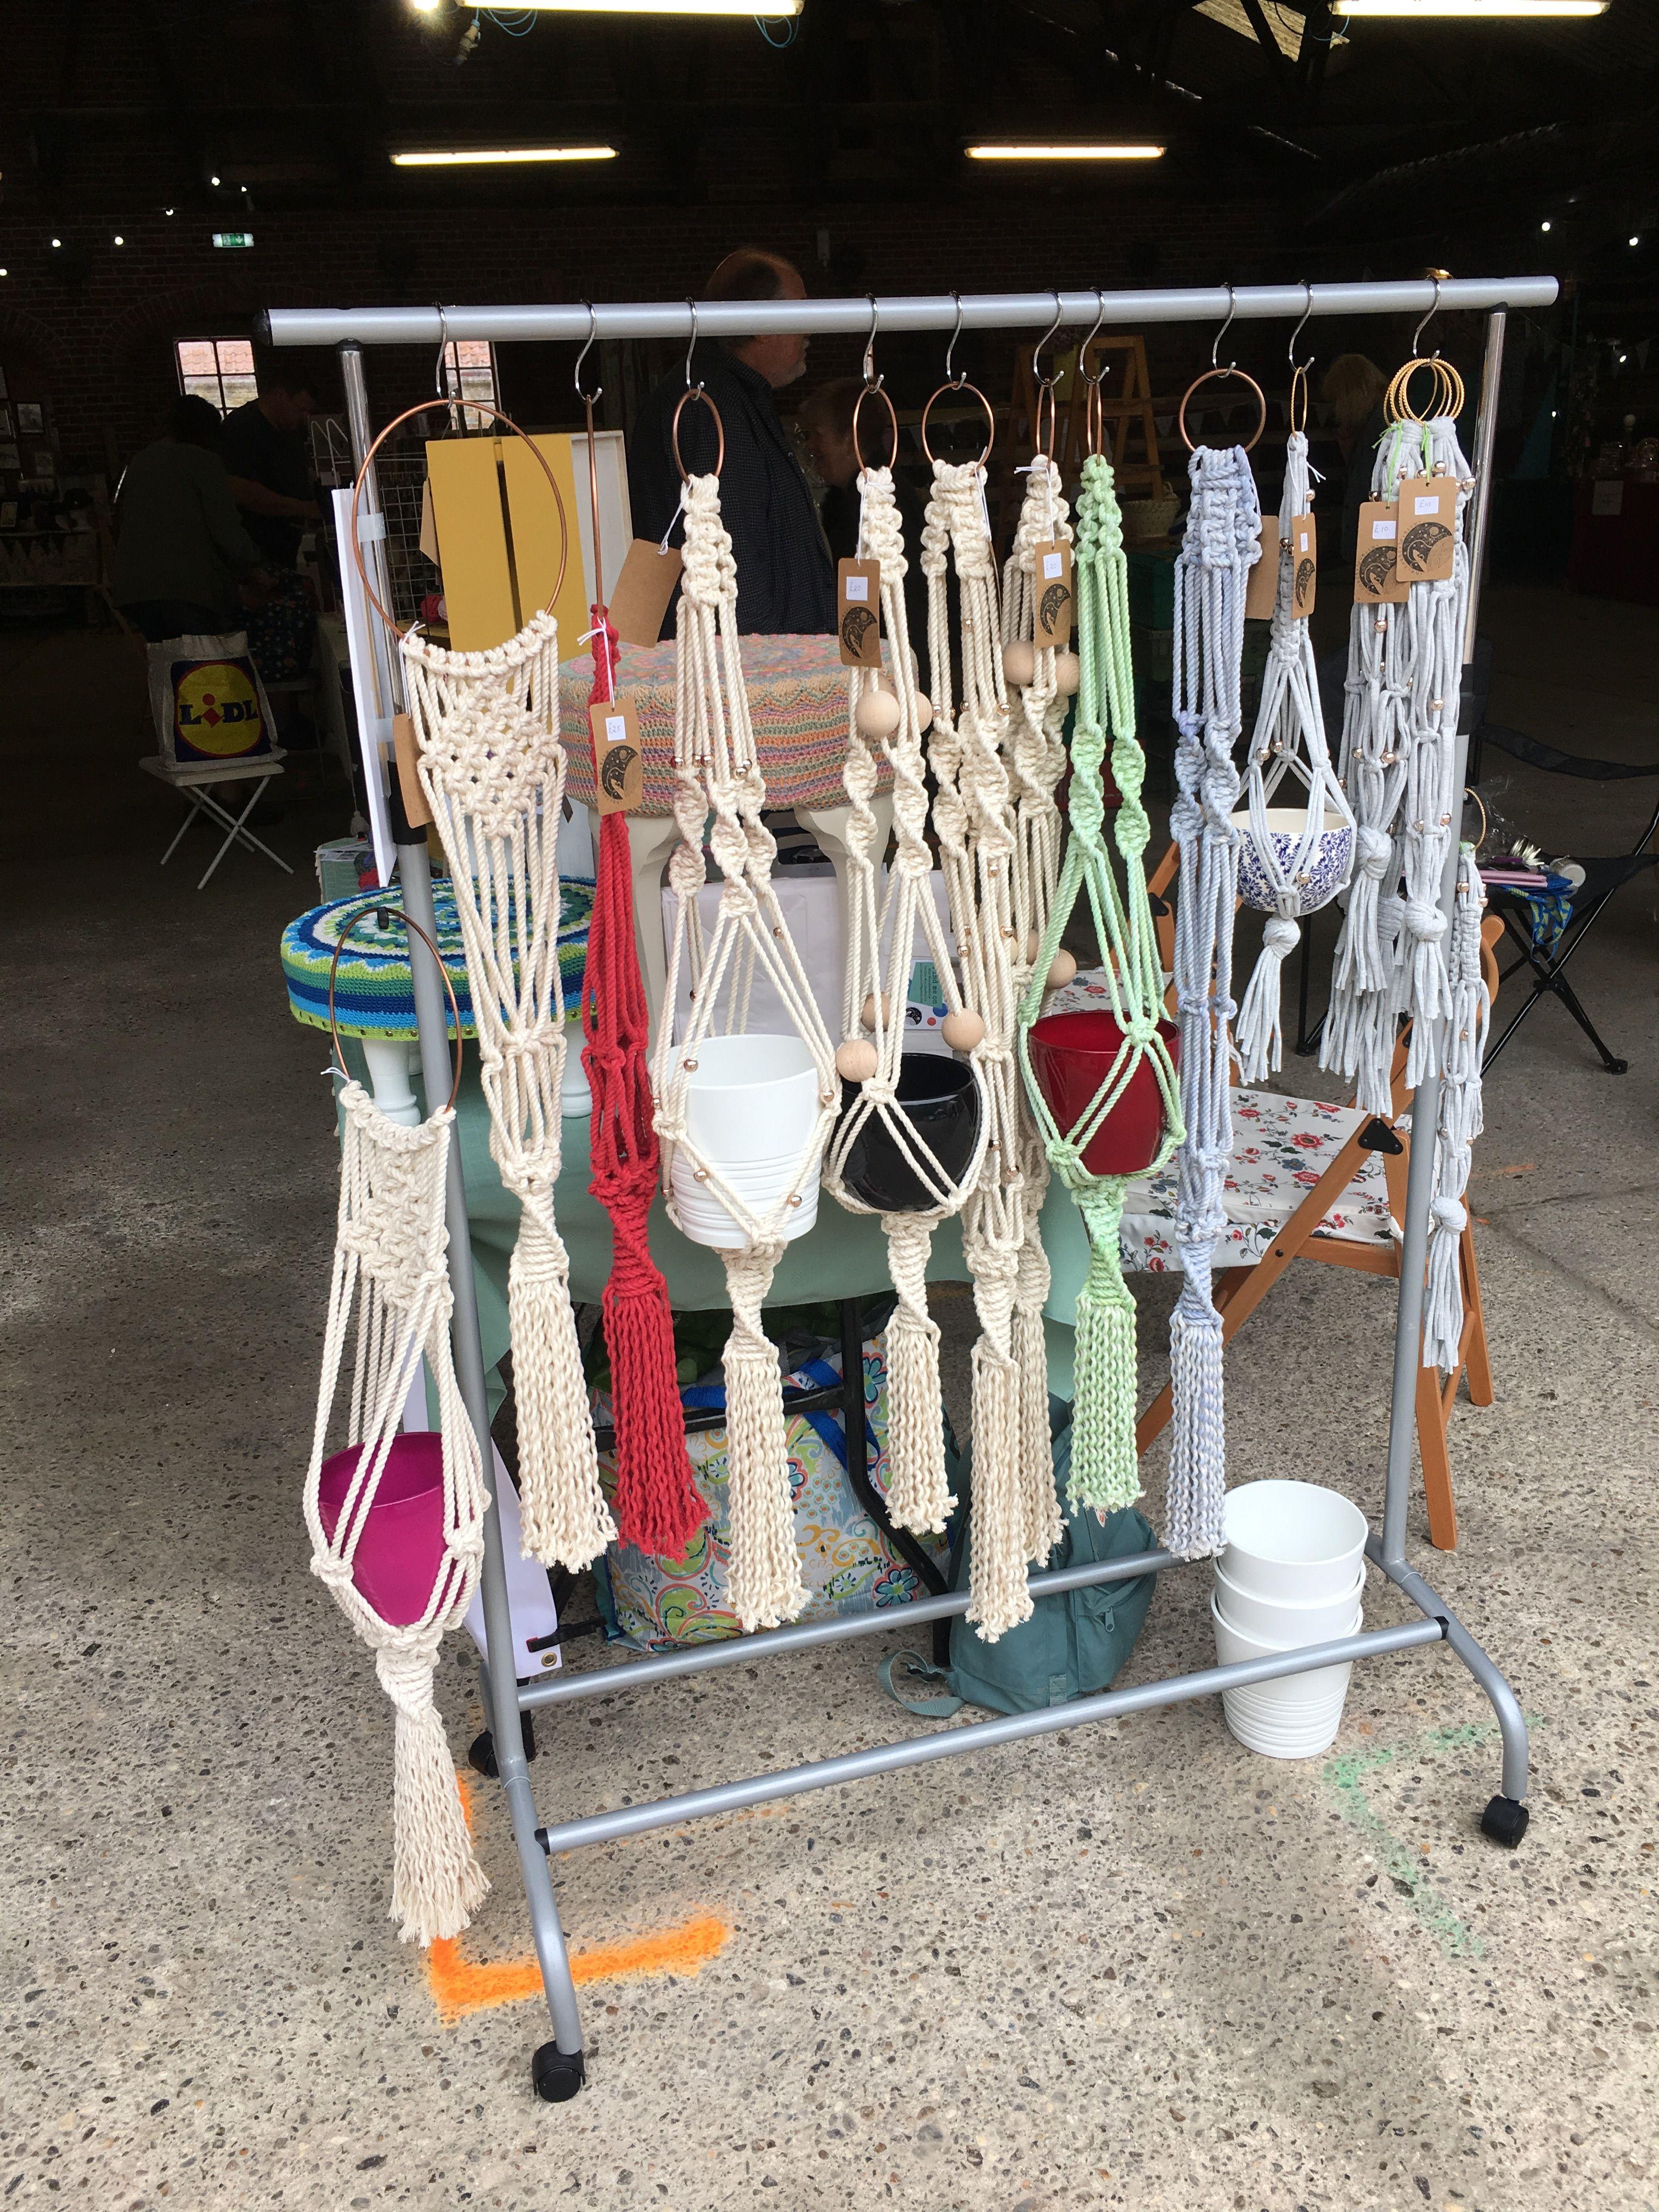 2fd941abf821 Sledmere Artisan Food and Craft Fair Macrame Hanging Baskets | tapiz ...